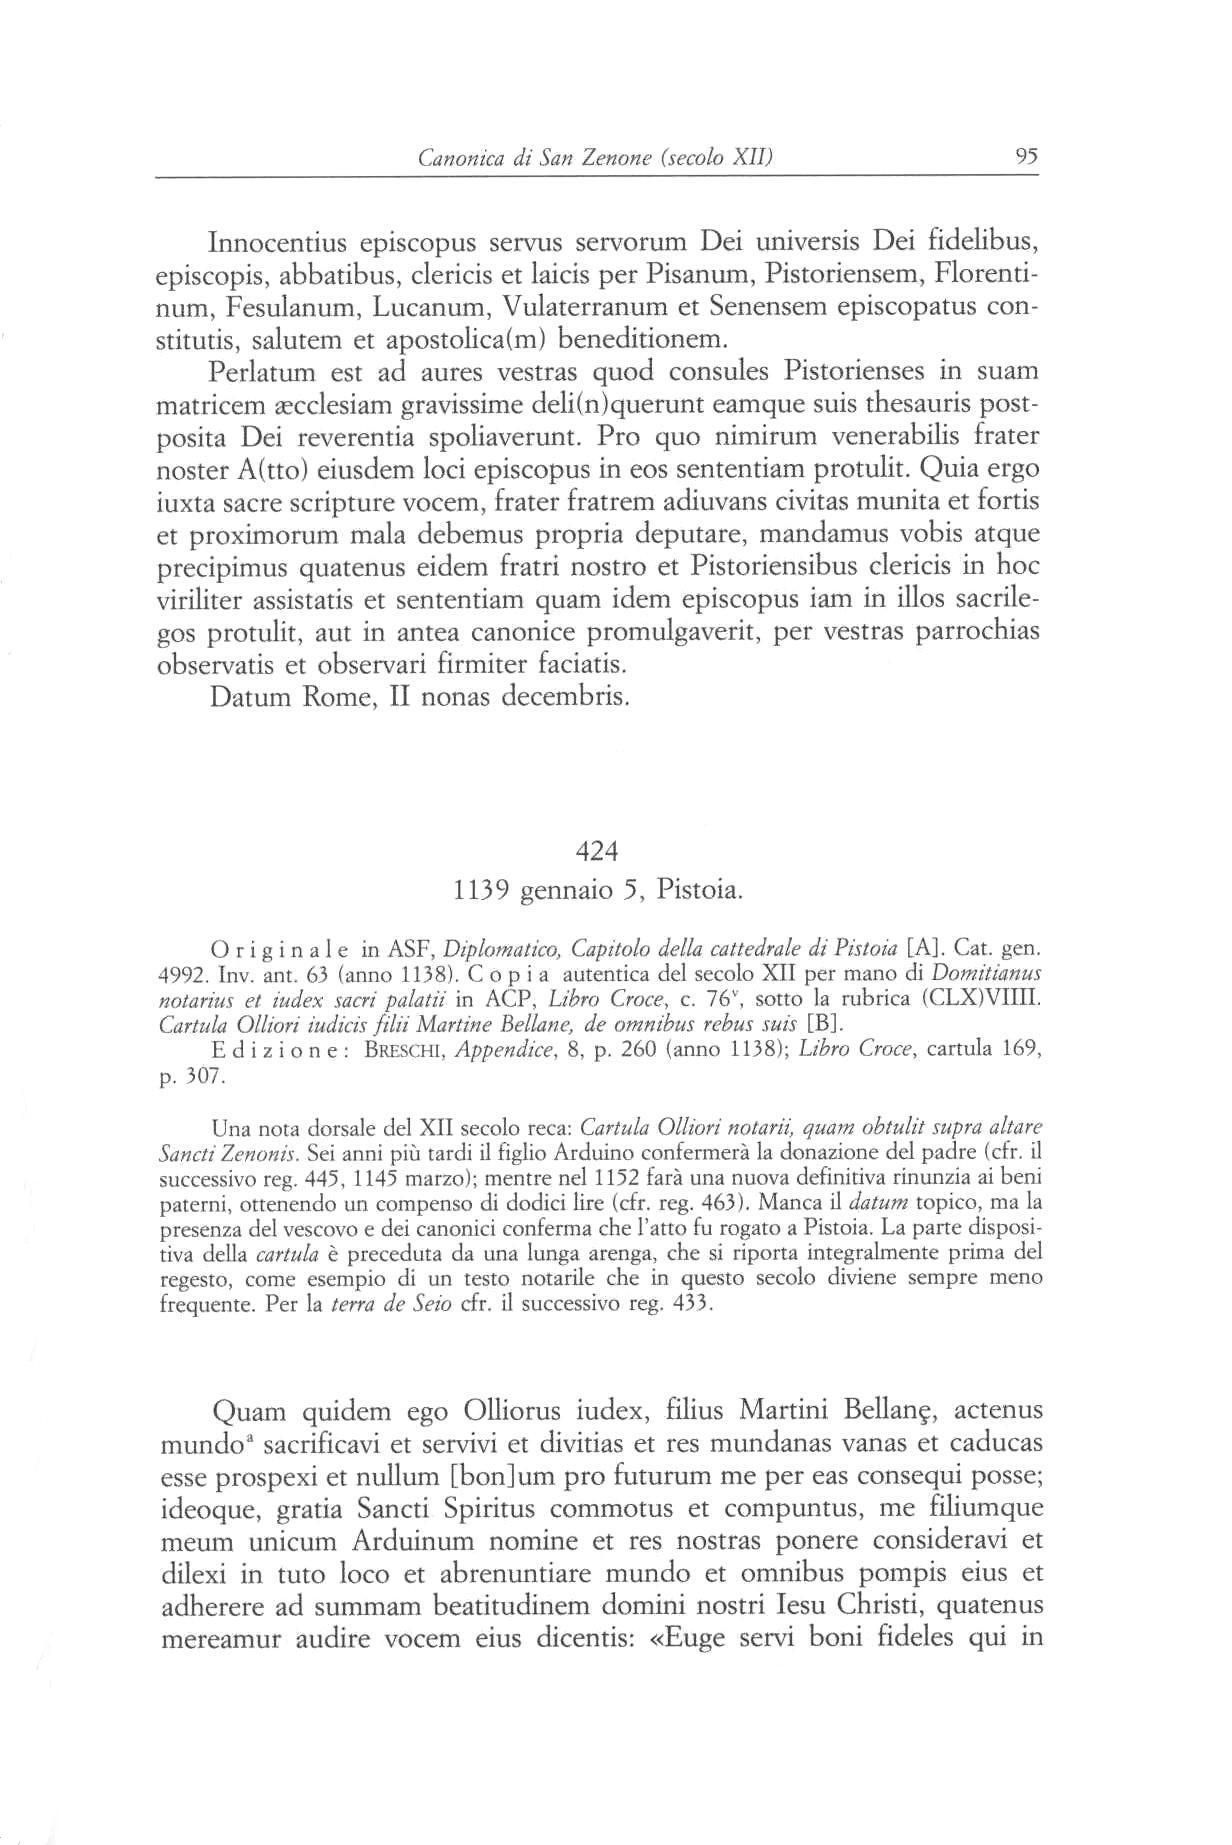 Canonica S. Zenone XII 0095.jpg